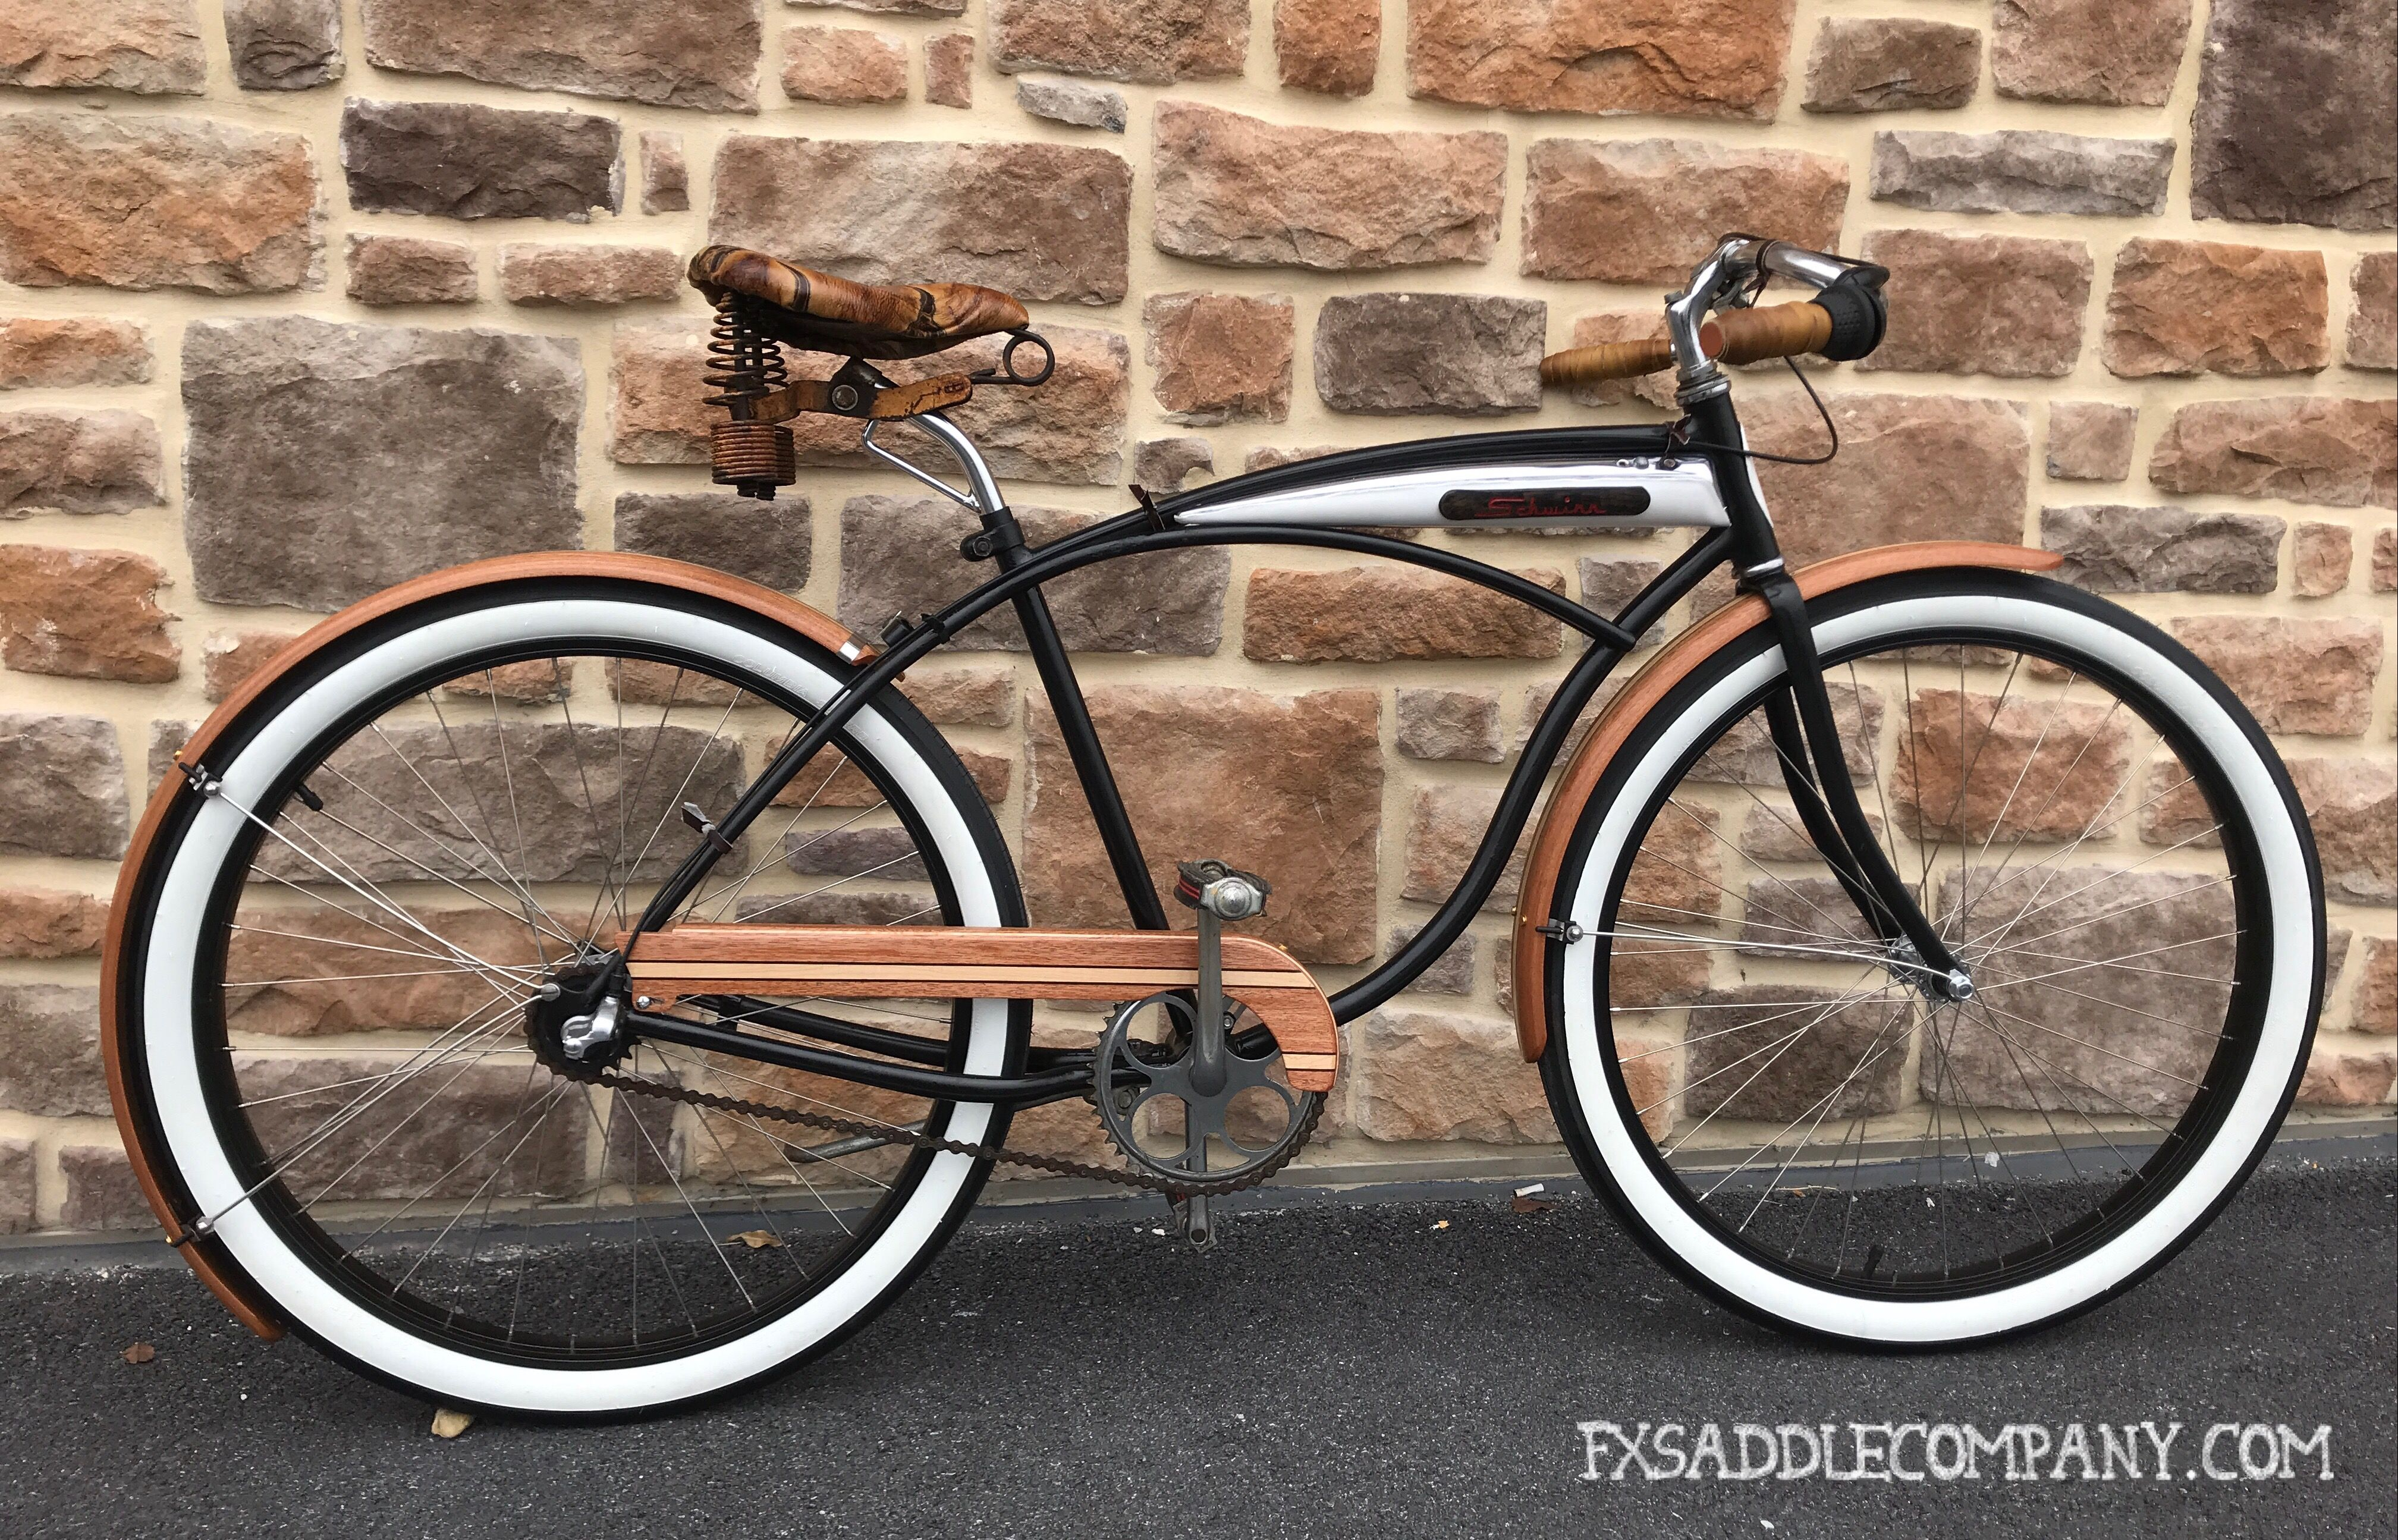 78fcccdcee8 Rat rod Schwinn Fleet bicycle with wood fenders | Rat Rod Bicycles ...